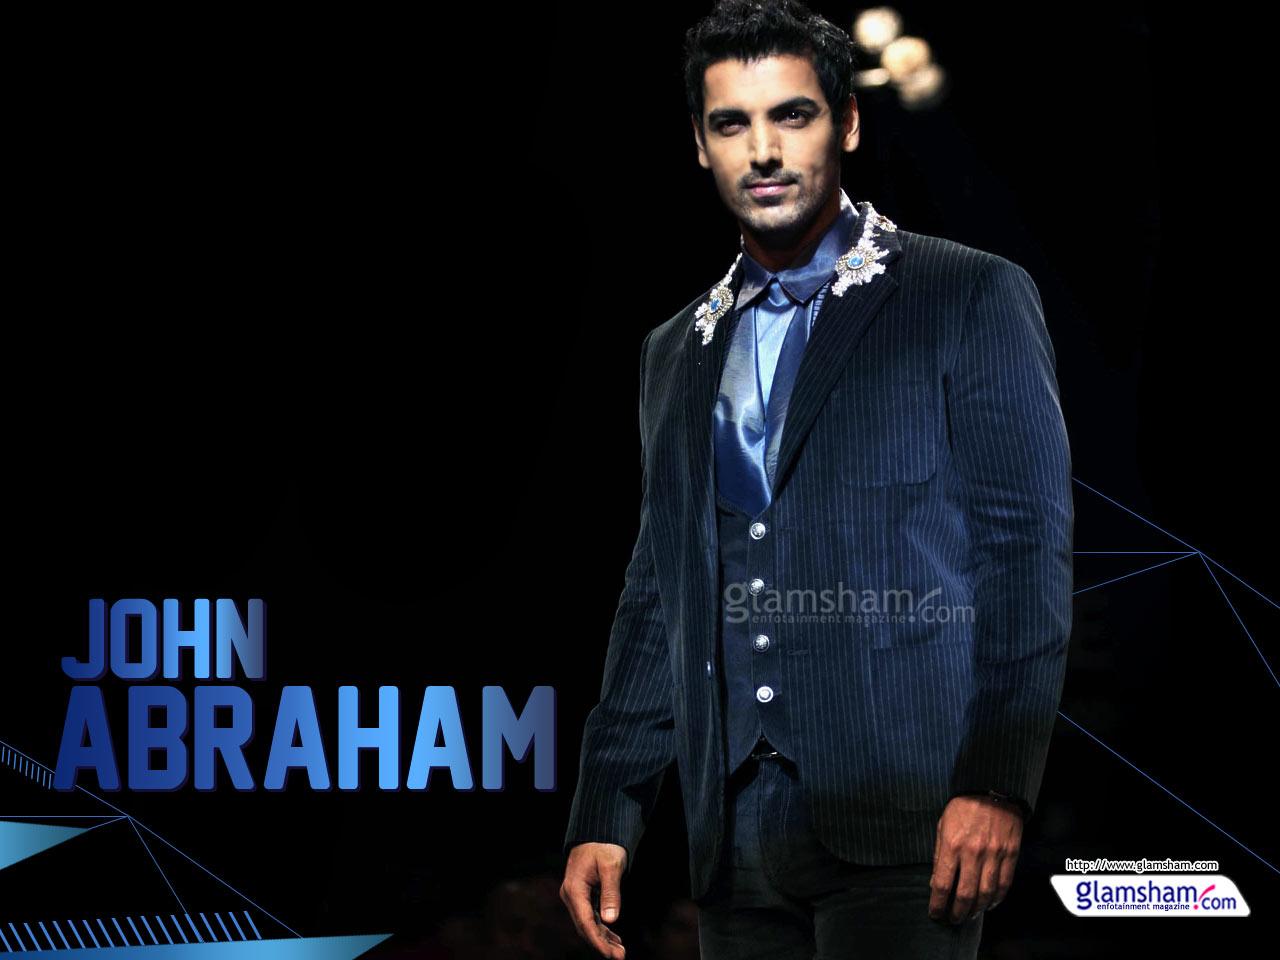 Download Free Hd Wallpapers Of John Abraham Download Free Hd 1280x960